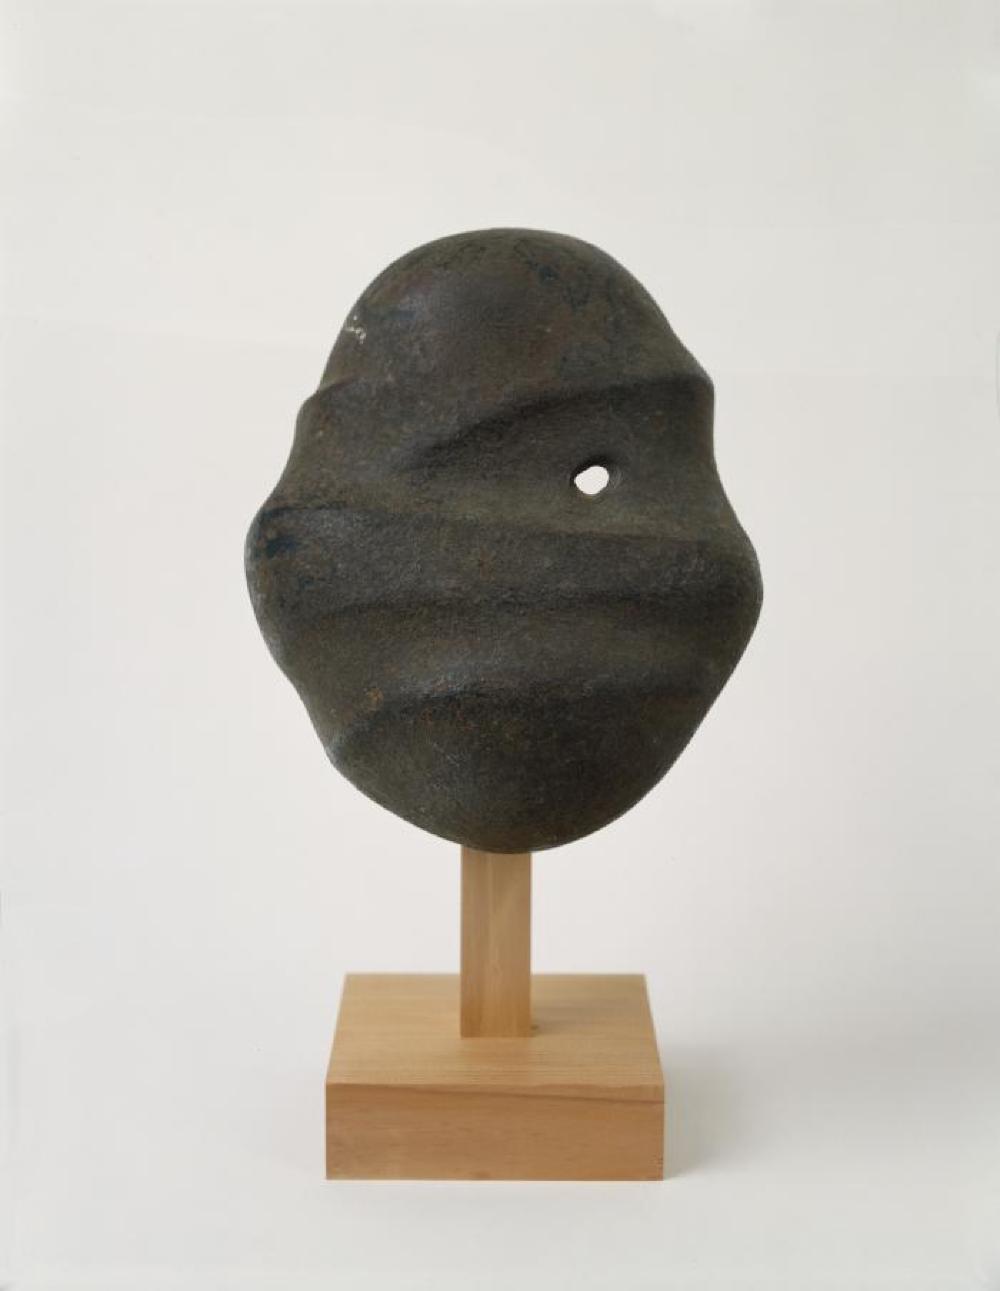 Okame (Atomic Head)